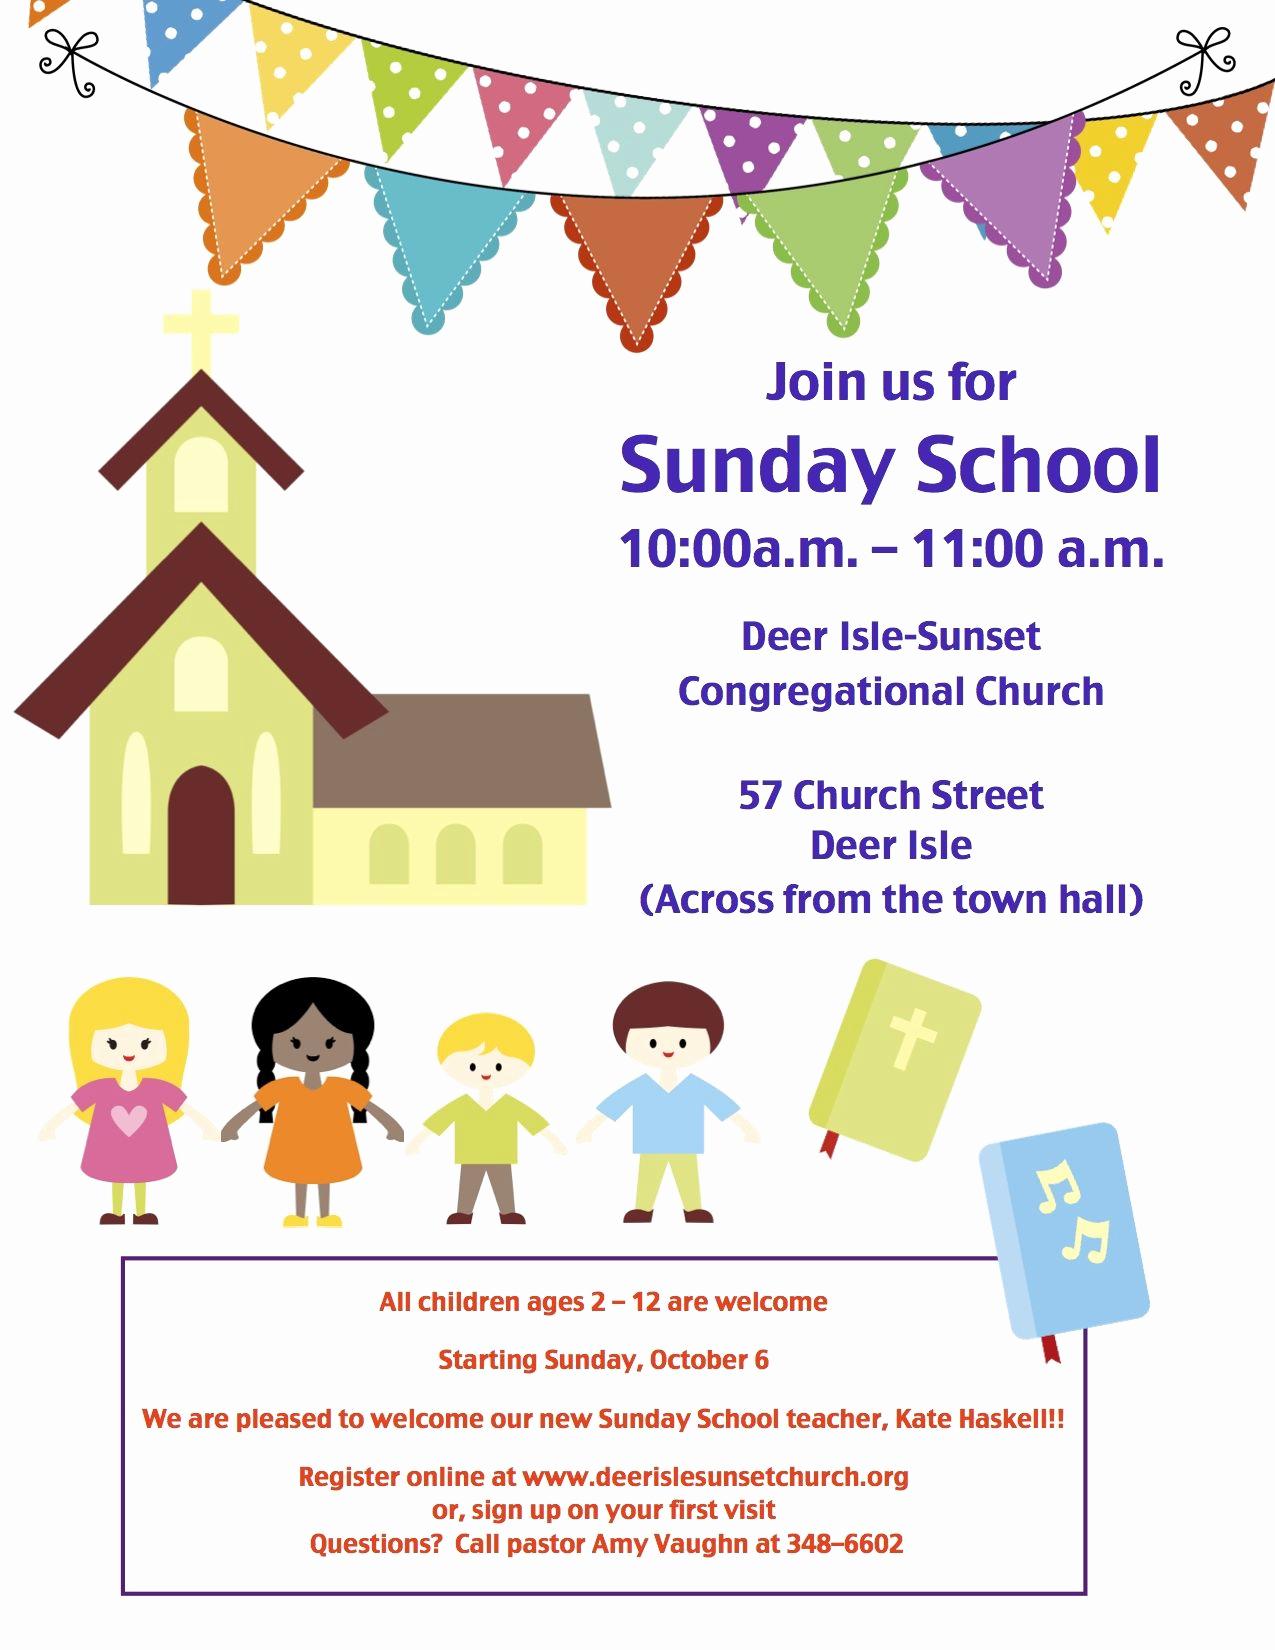 Sunday School Invitation Ideas Lovely Sunday School Invitation Flyer Google Search